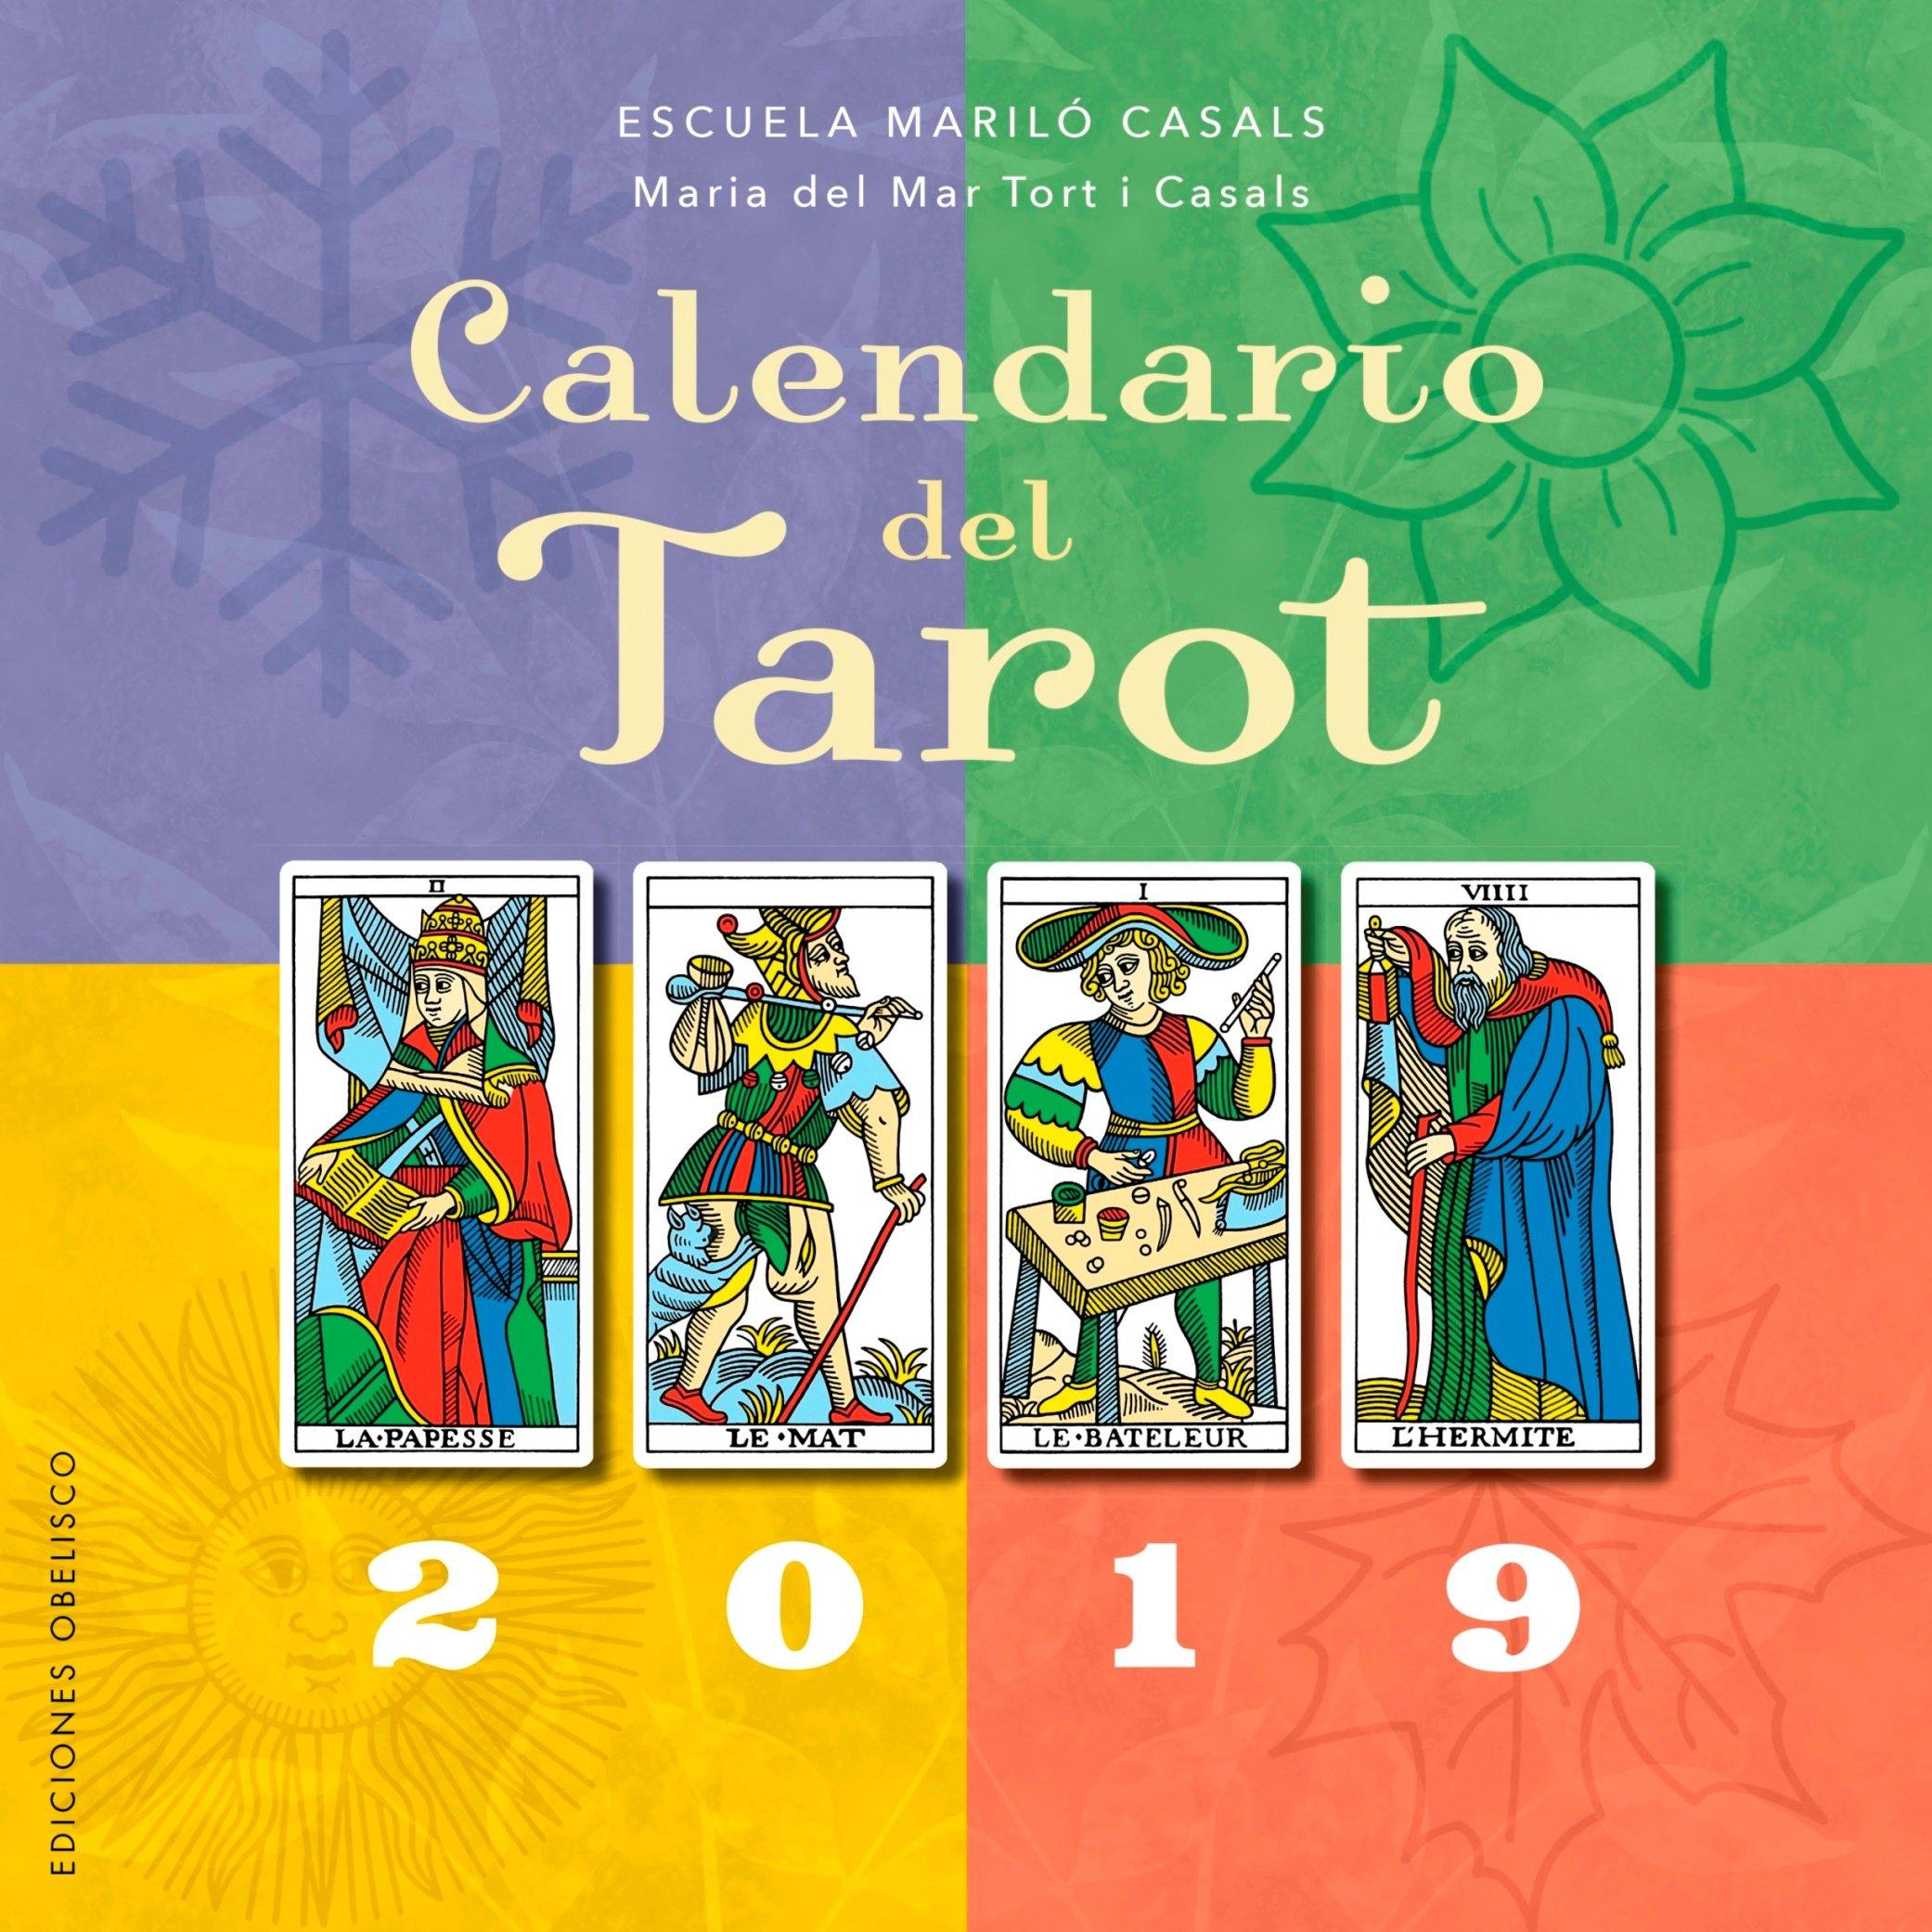 Calendario del Tarot 2019 (AGENDAS) Tapa blanda – Calendario mural, 3 sep 2018 Maria del Mar Tort EDICIONES OBELISCO S.L. 8491113614 BODY